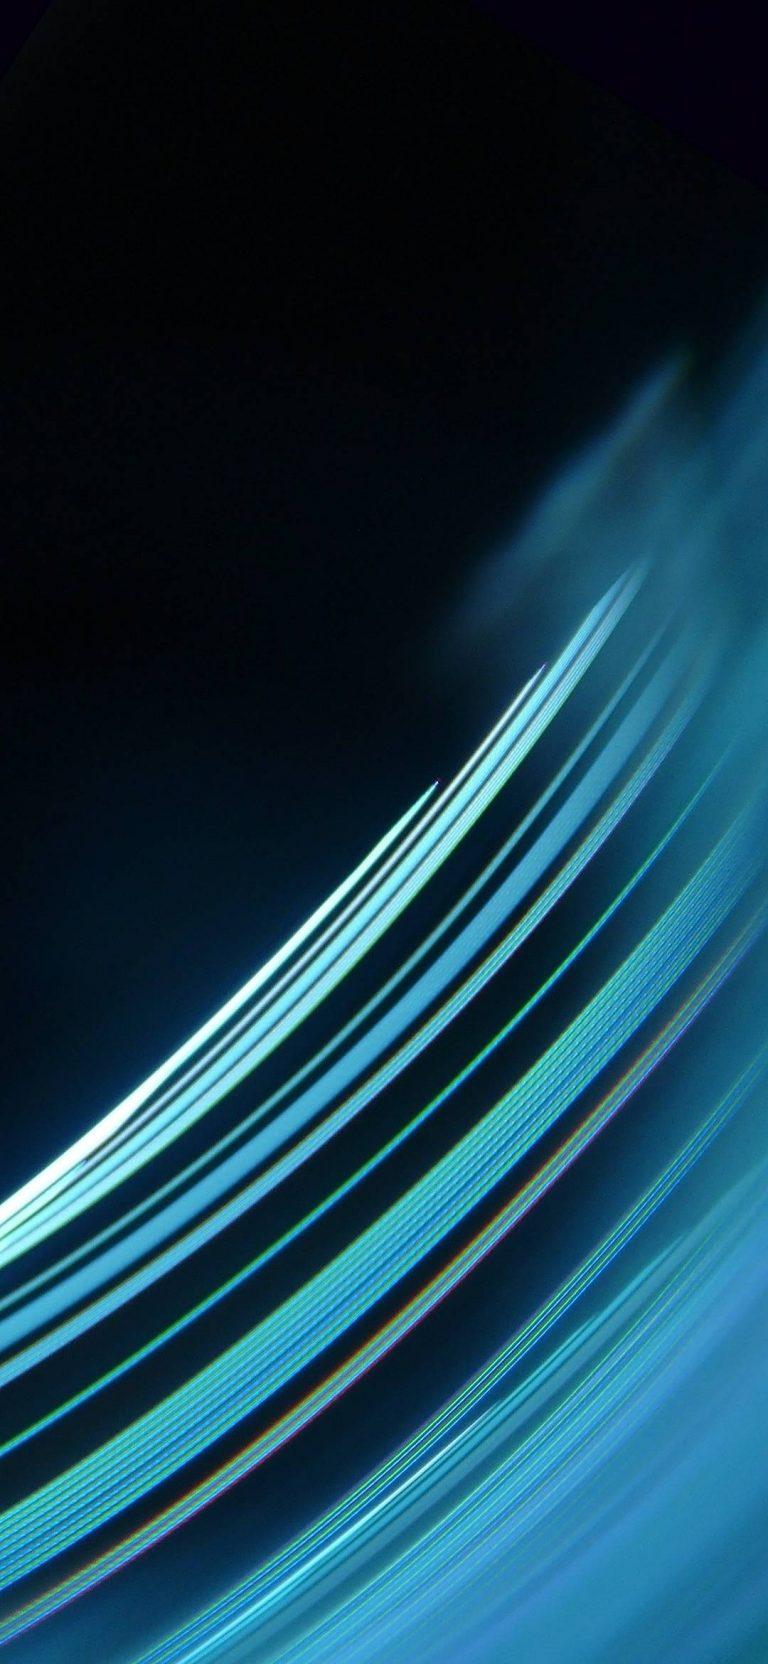 OnePlus 6T McLaren Edition Wallpaper 04 1080x2340 768x1664